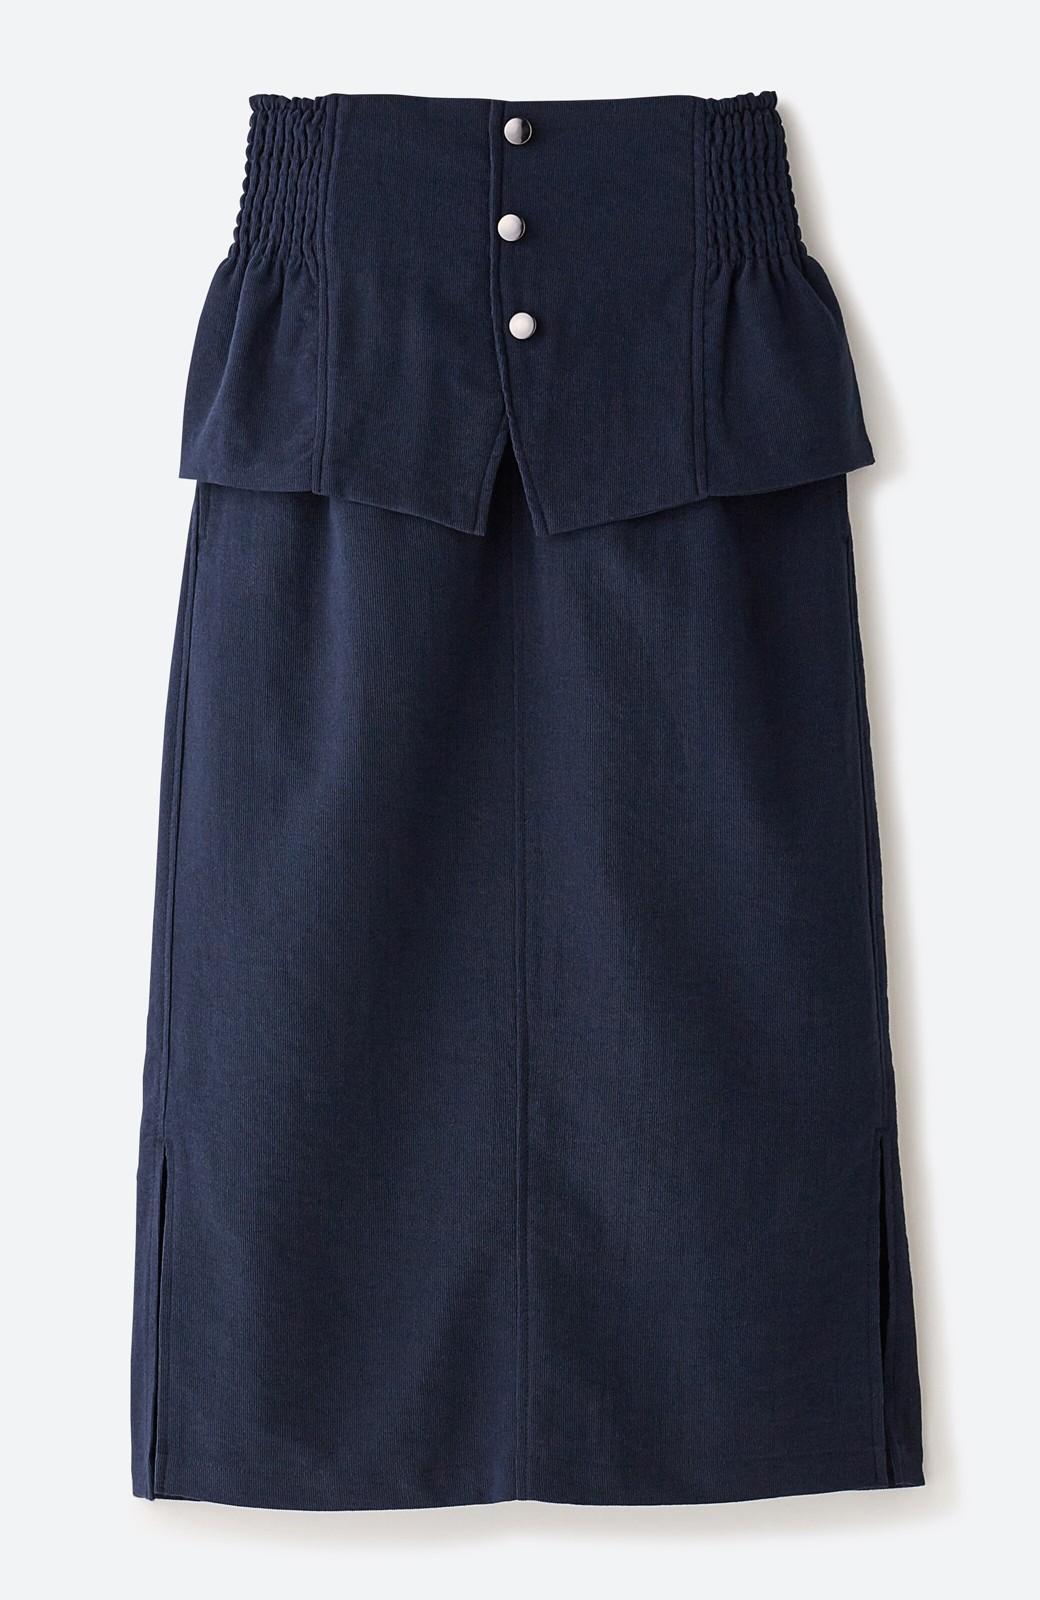 haco!  腹巻きとは呼ばせない ブルー期も華やかに過ごせる消臭加工裏地付きフリルデザインスカートセット【ブルー期】女の子バンザイ!プロジェクト <ネイビー>の商品写真10